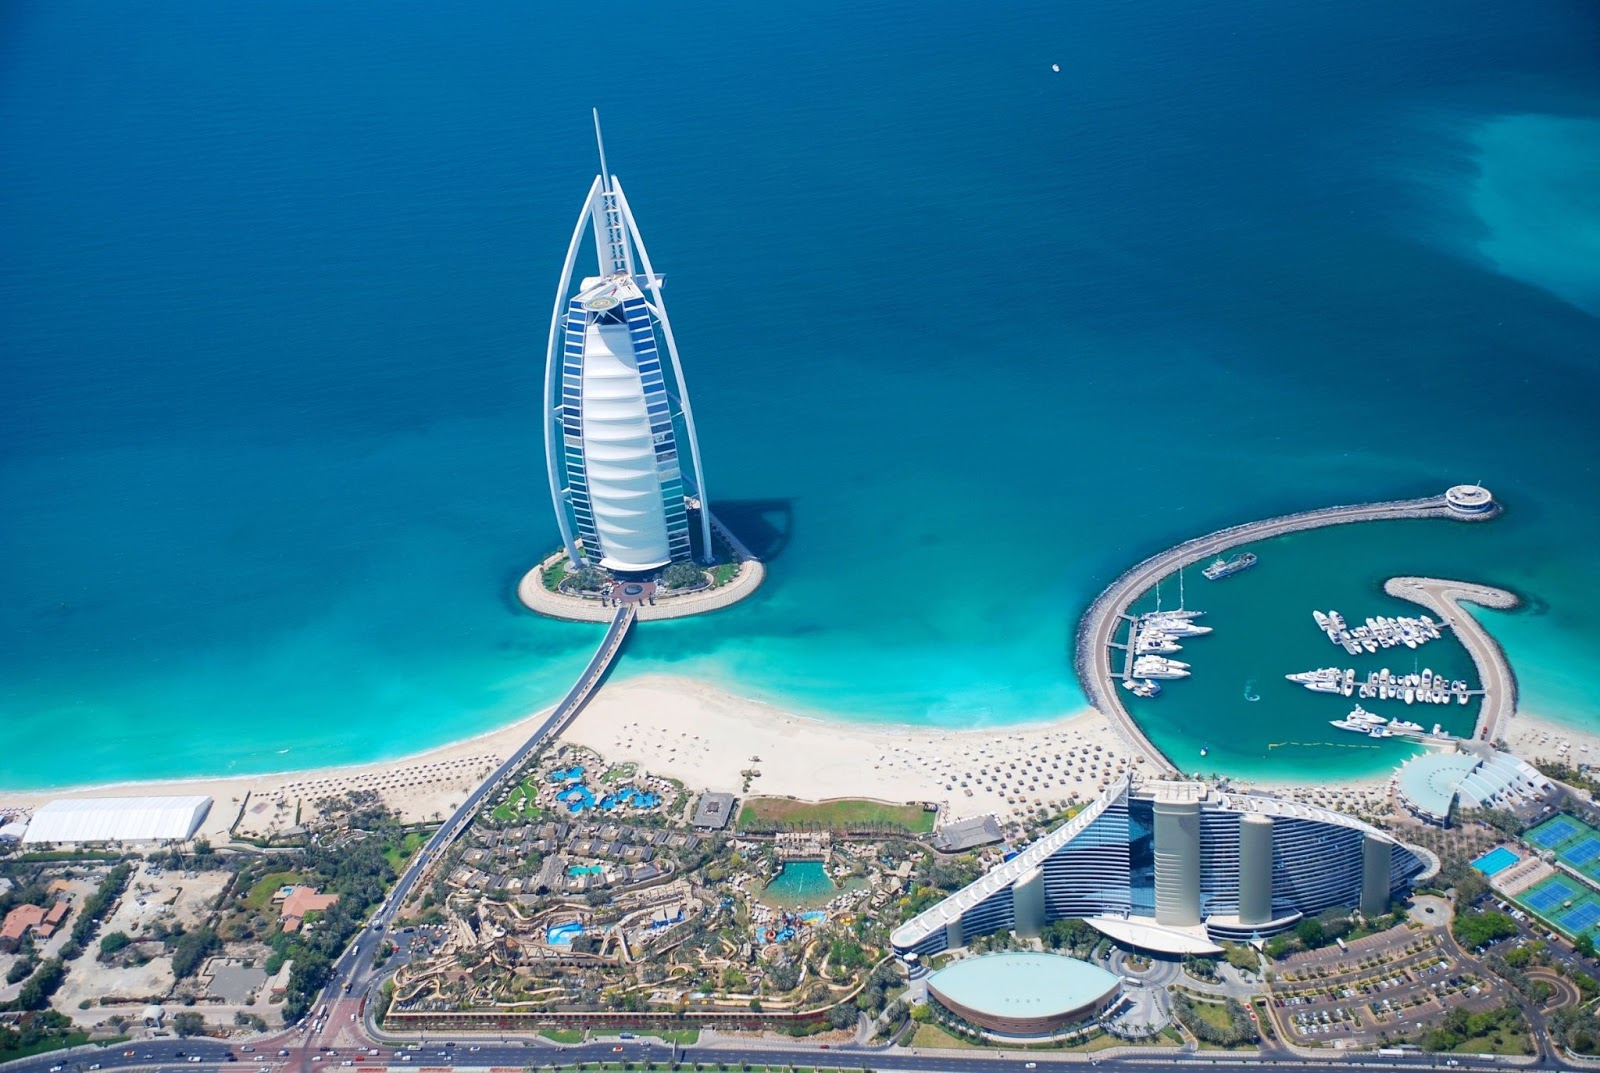 The iconic Burj Al Arab designed after a